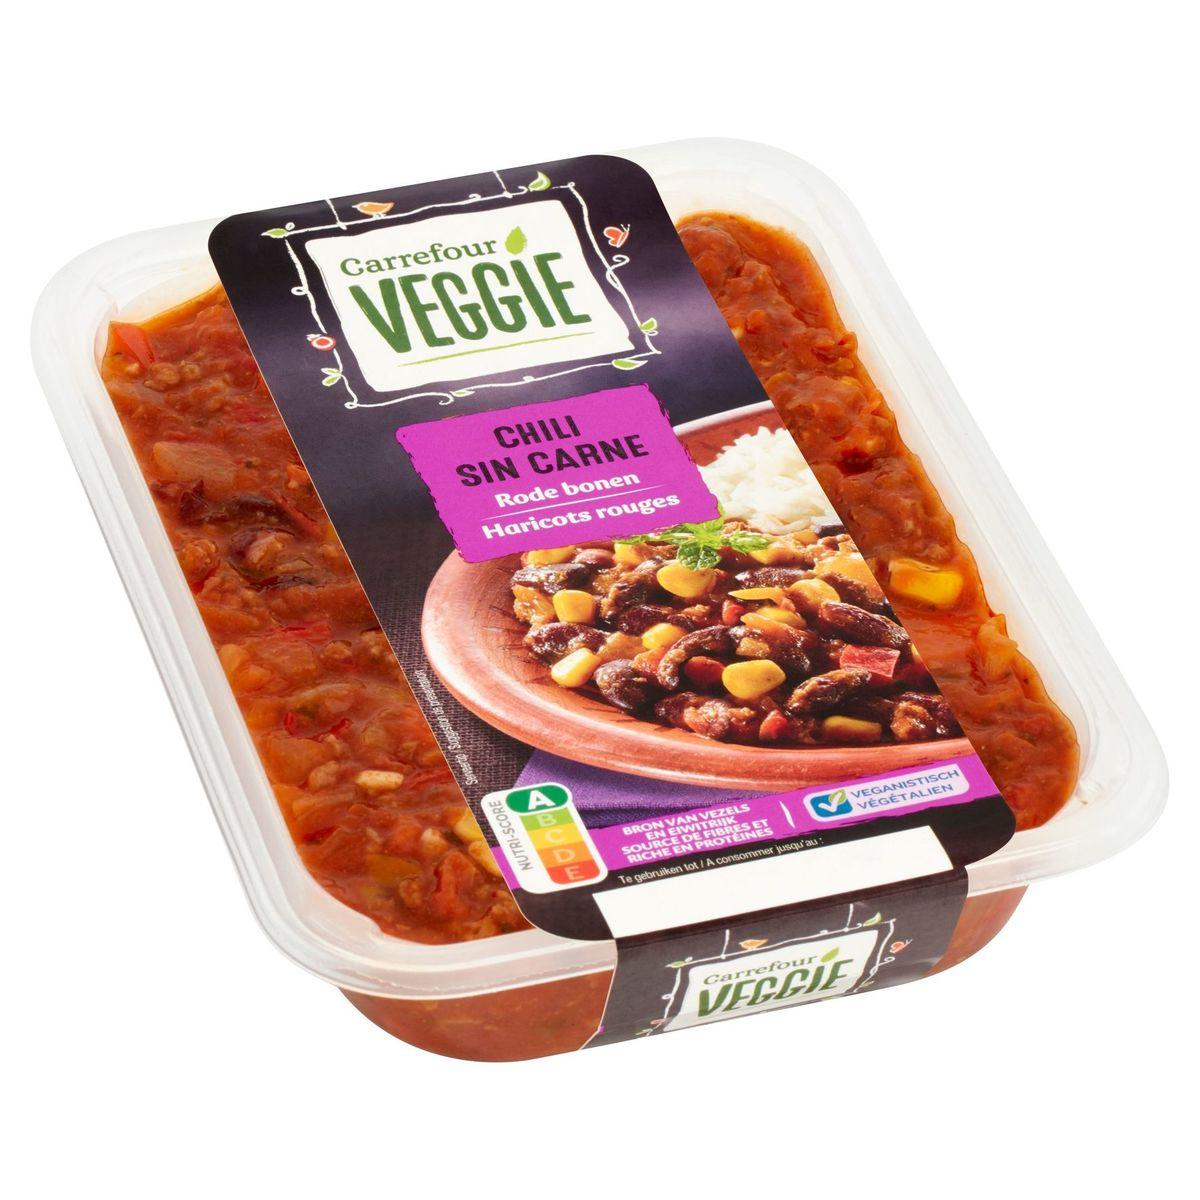 Carrefour Veggie Chili Sin Carne Rode Bonen 500 g